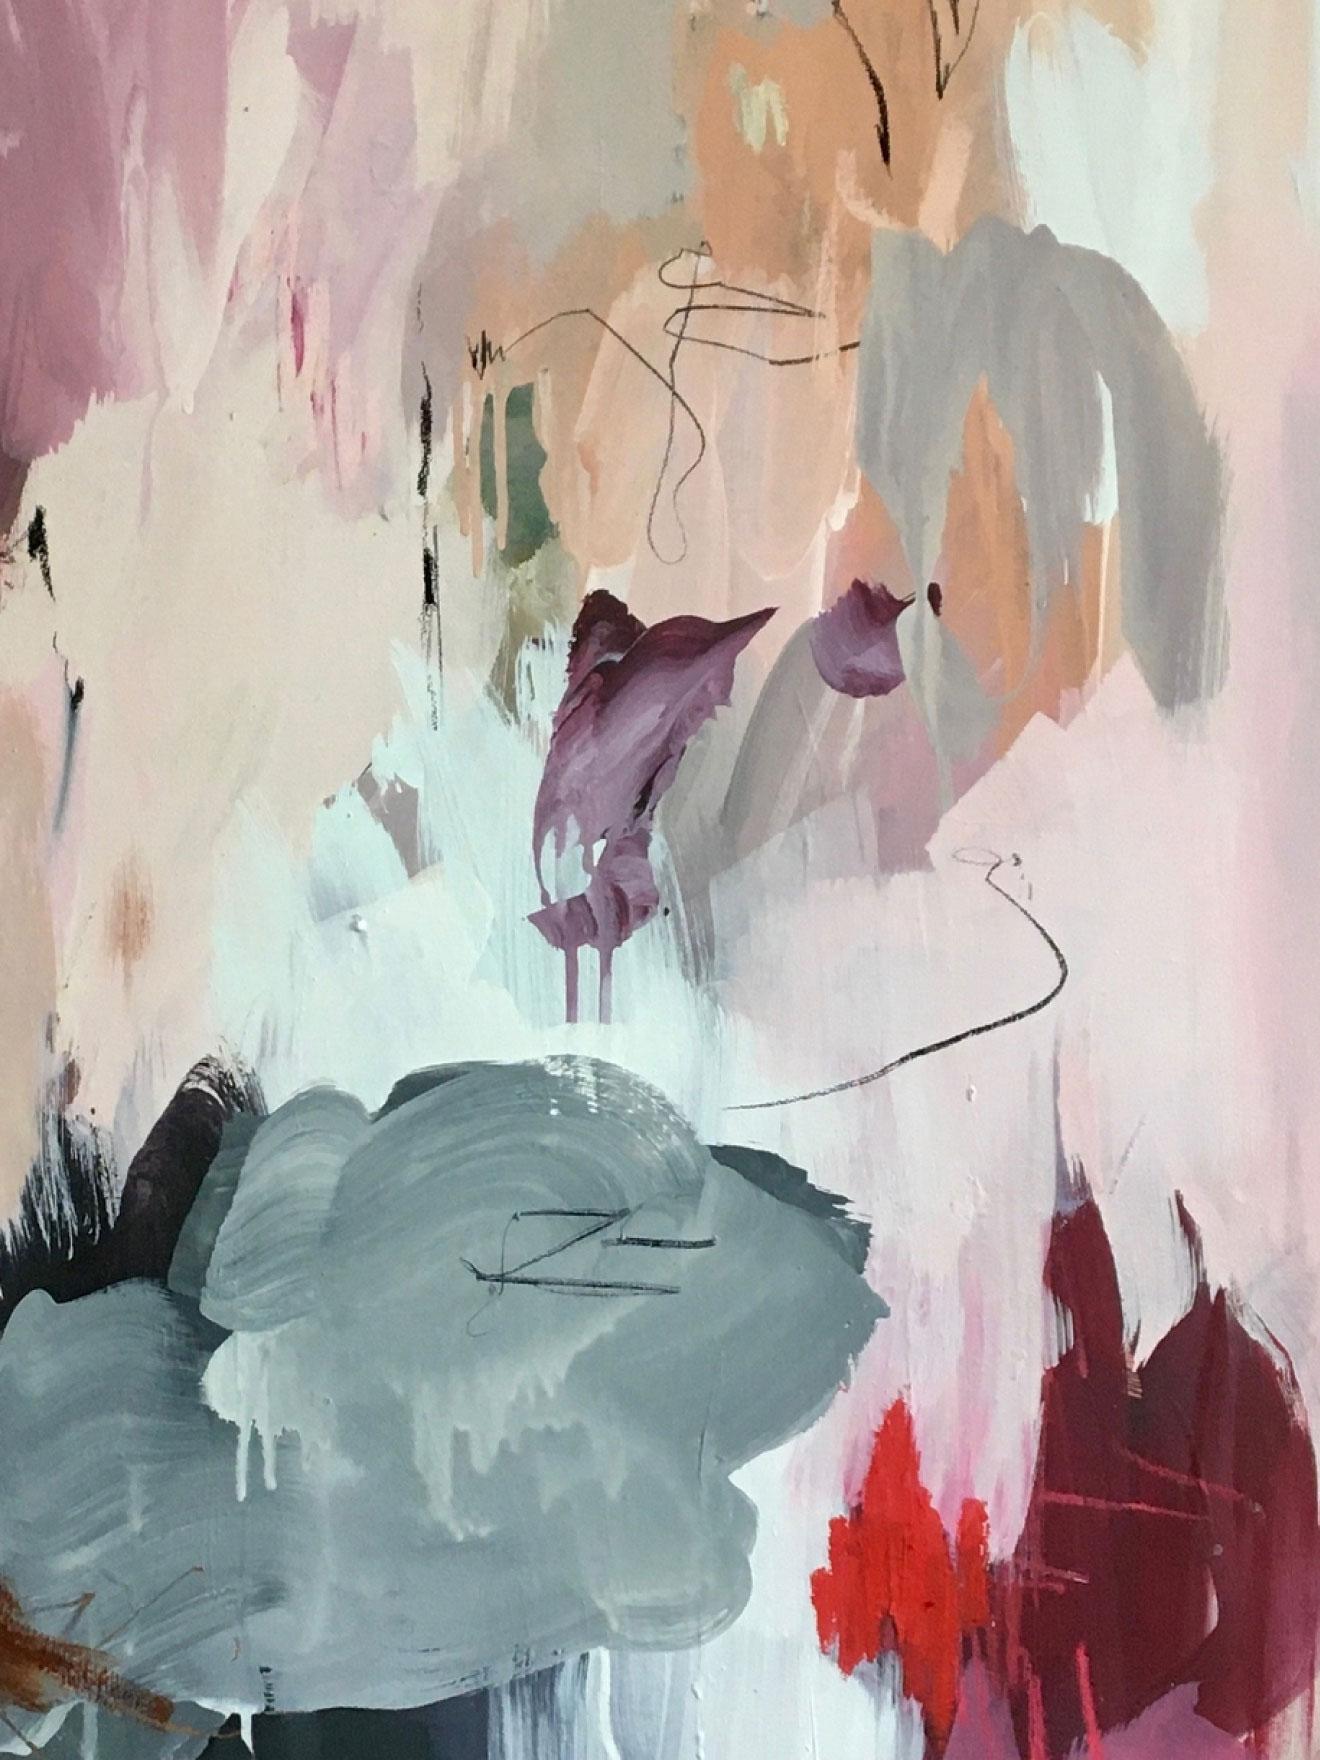 Artwork Buy Original Art Online Paintings More Saatchi Art